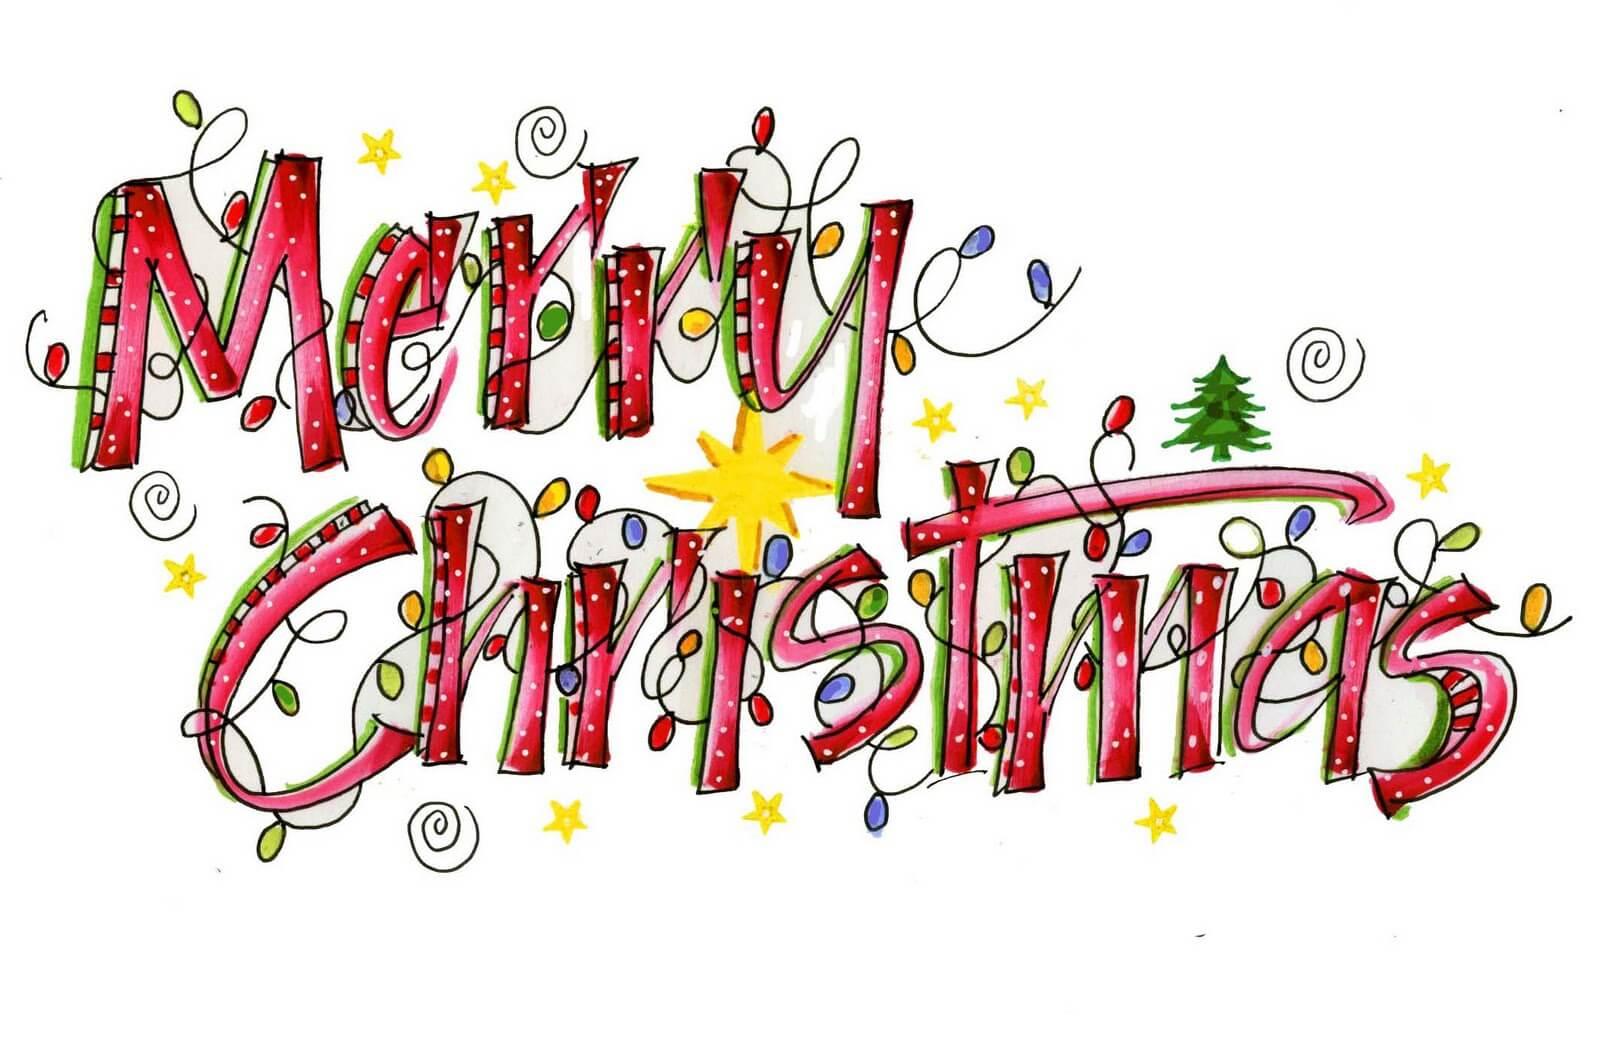 Merry Christmas – 2013